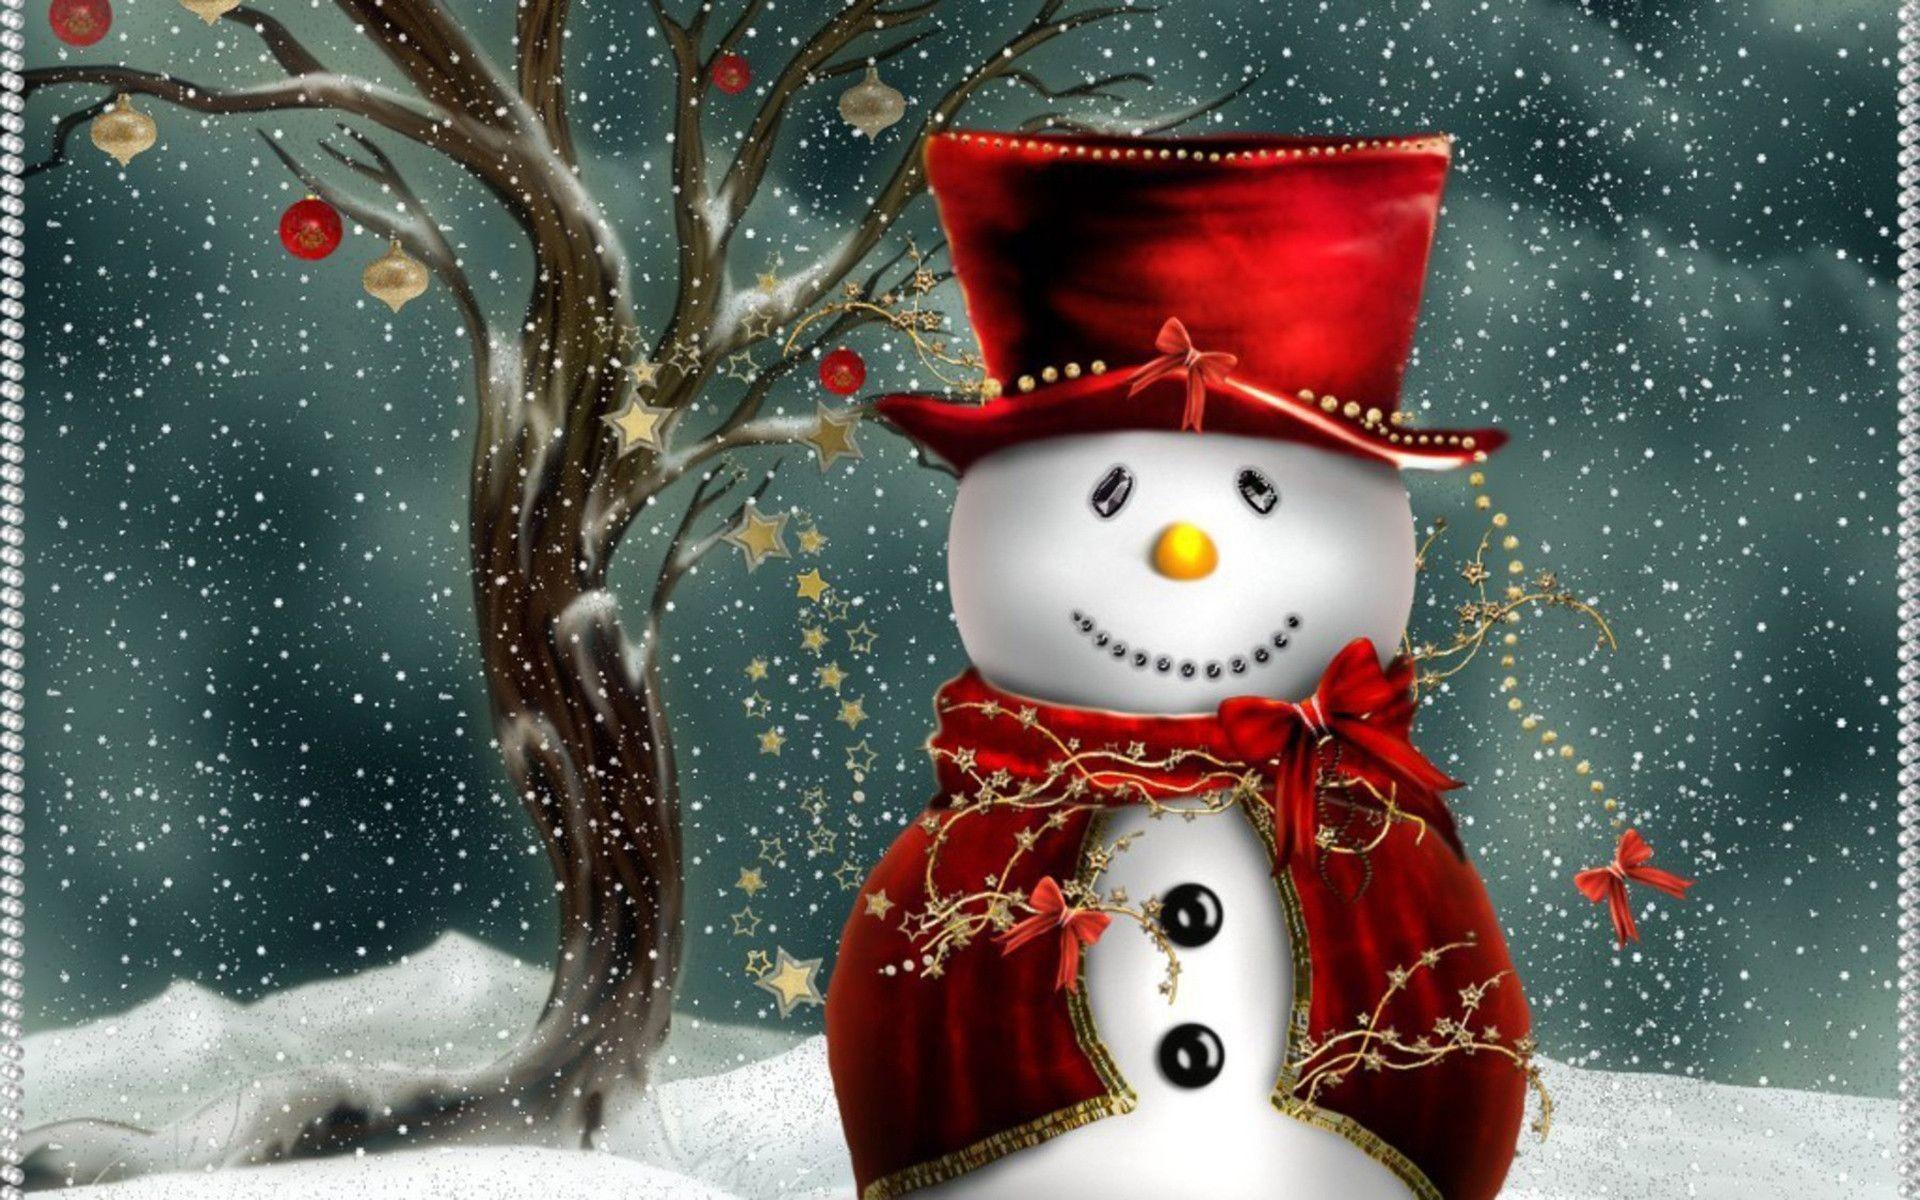 Cute Christmas Desktop Wallpaper.